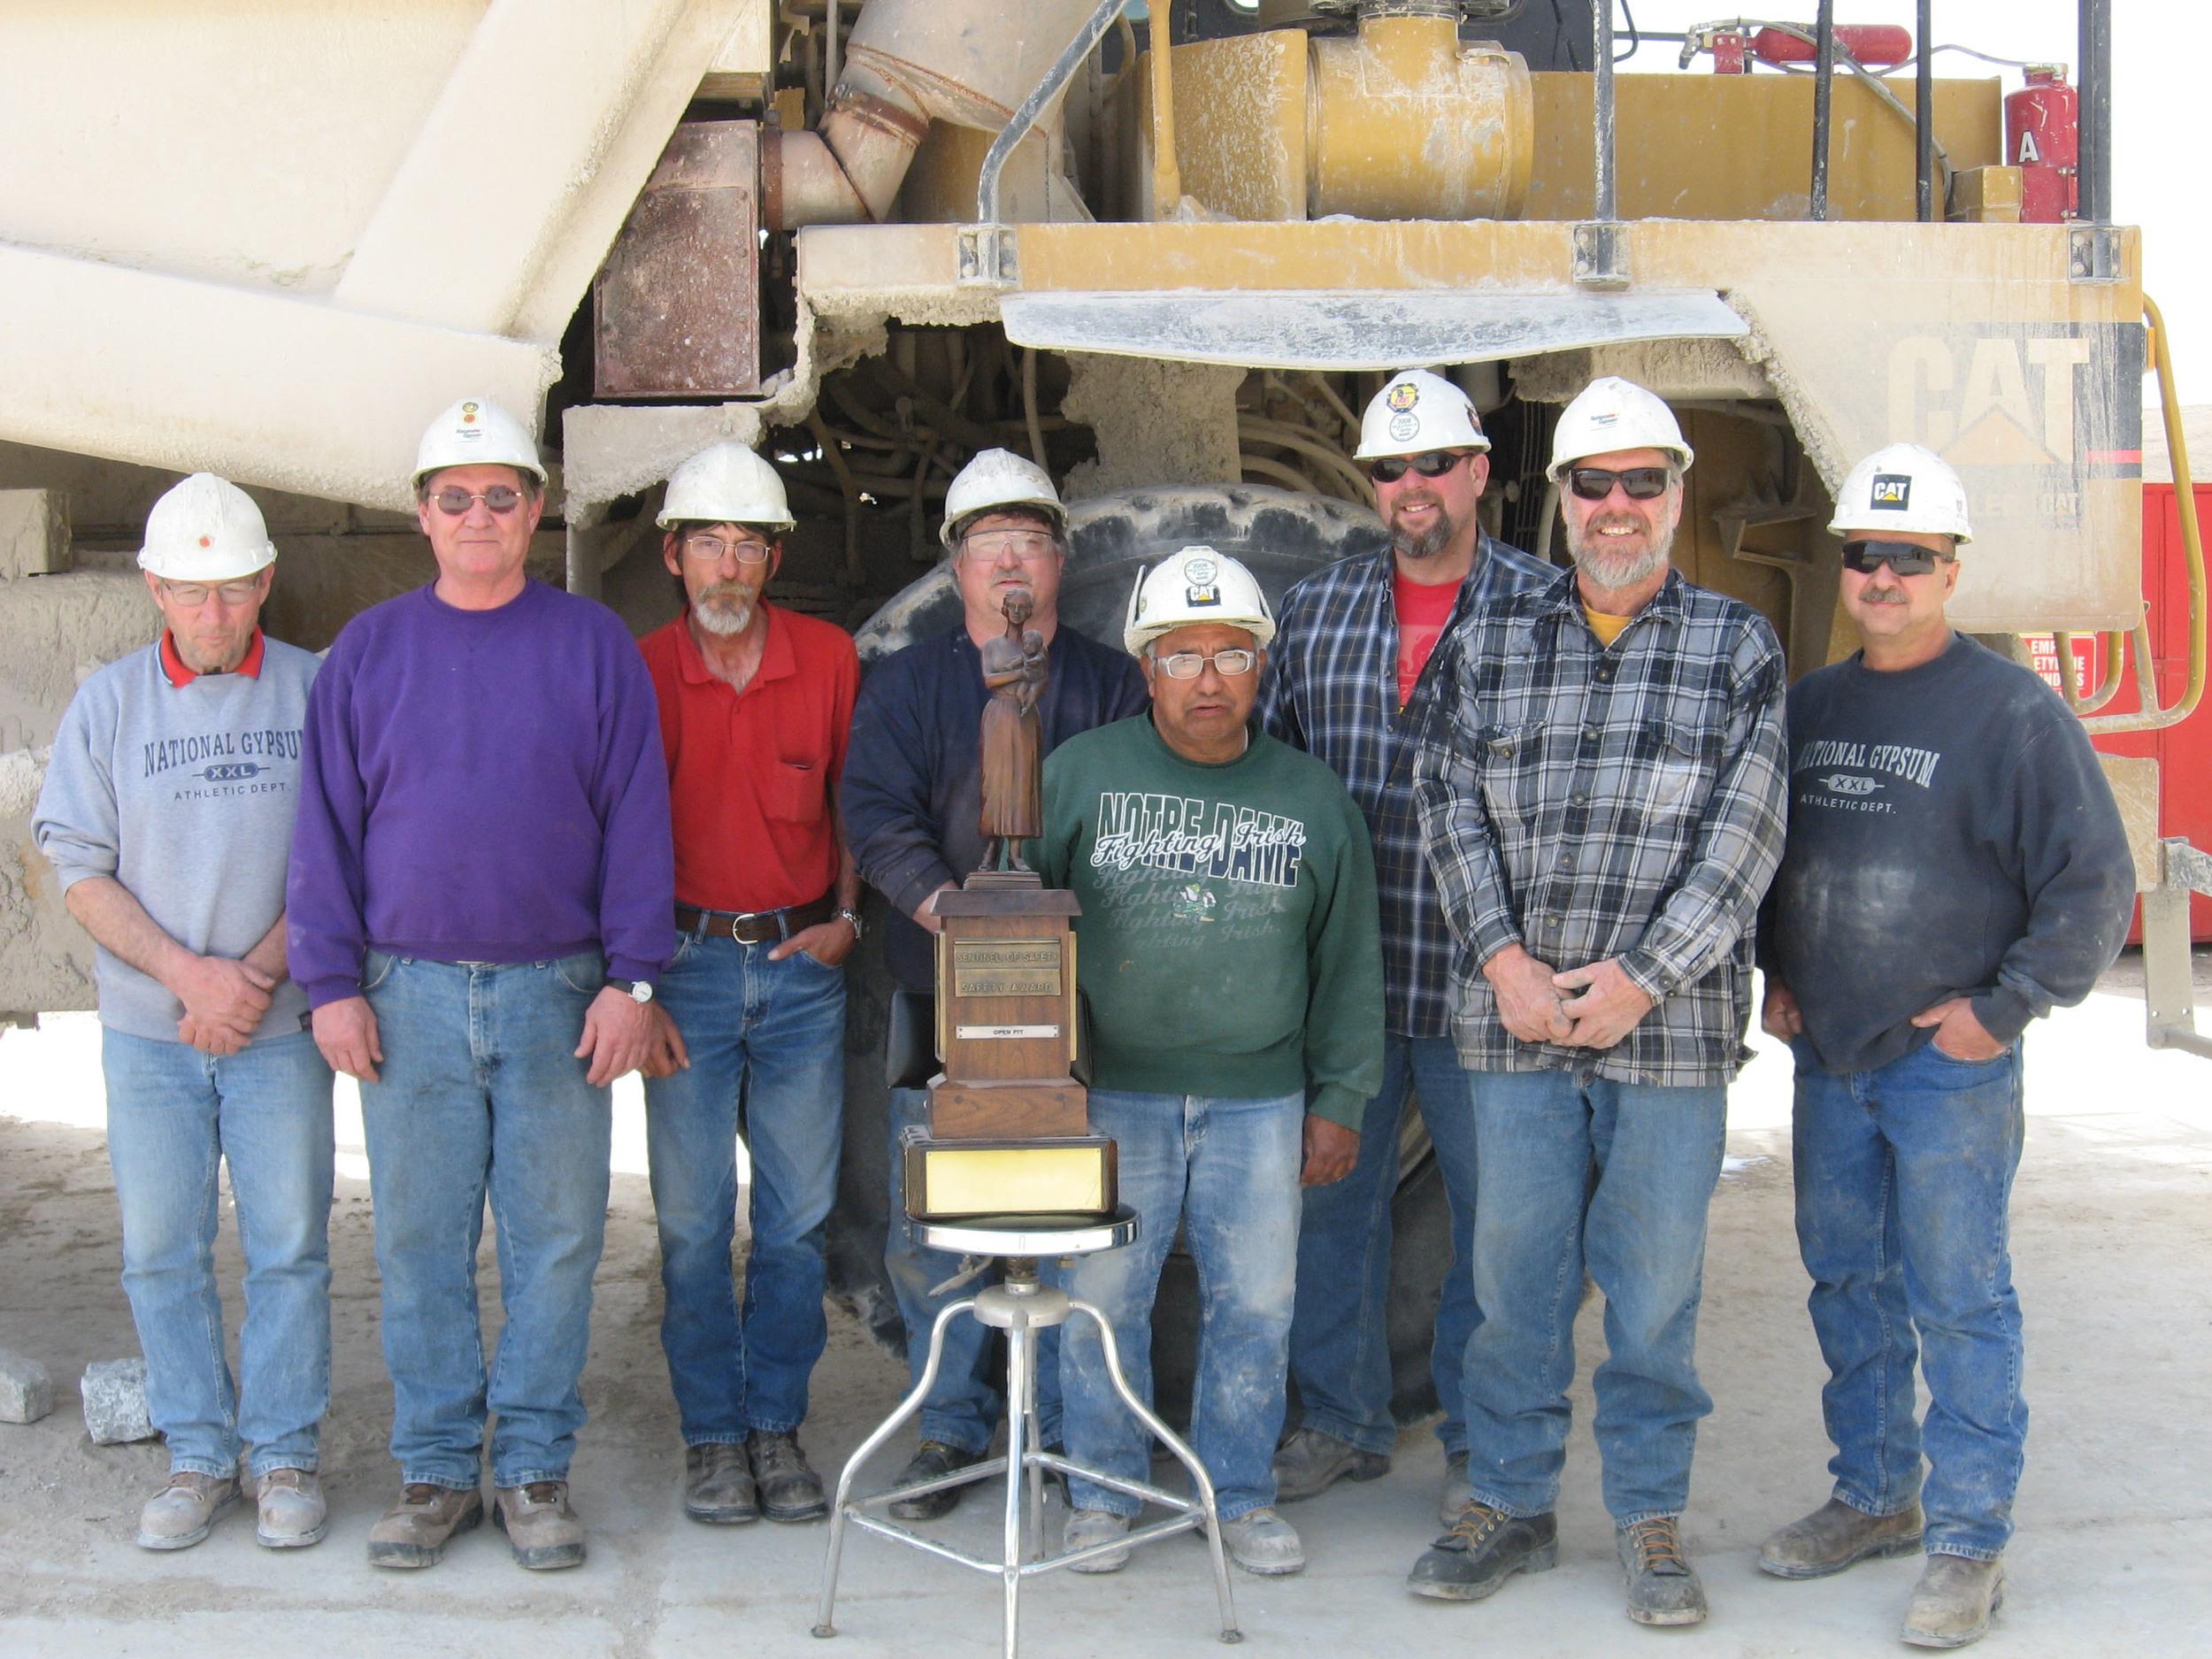 Lodge D66 Members Earn Top Mine Safety Award